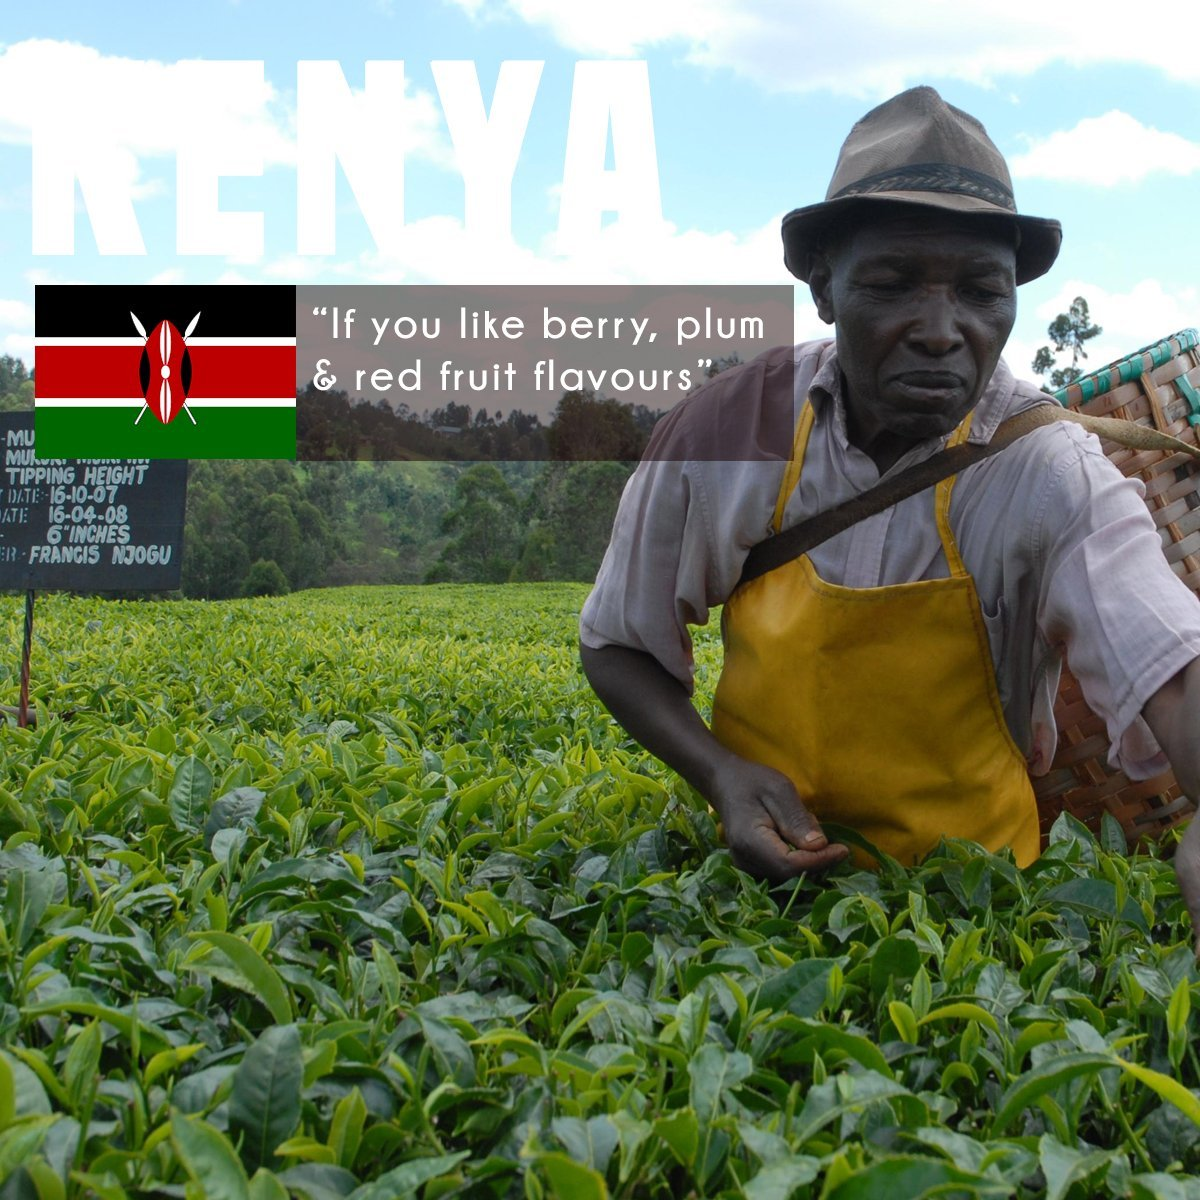 Kenya-Peaberry-Green-Coffee-Beans-100-Arabica-Speciality-Single-Origin-Kenya-Green-Beans-For-Home-Roasting